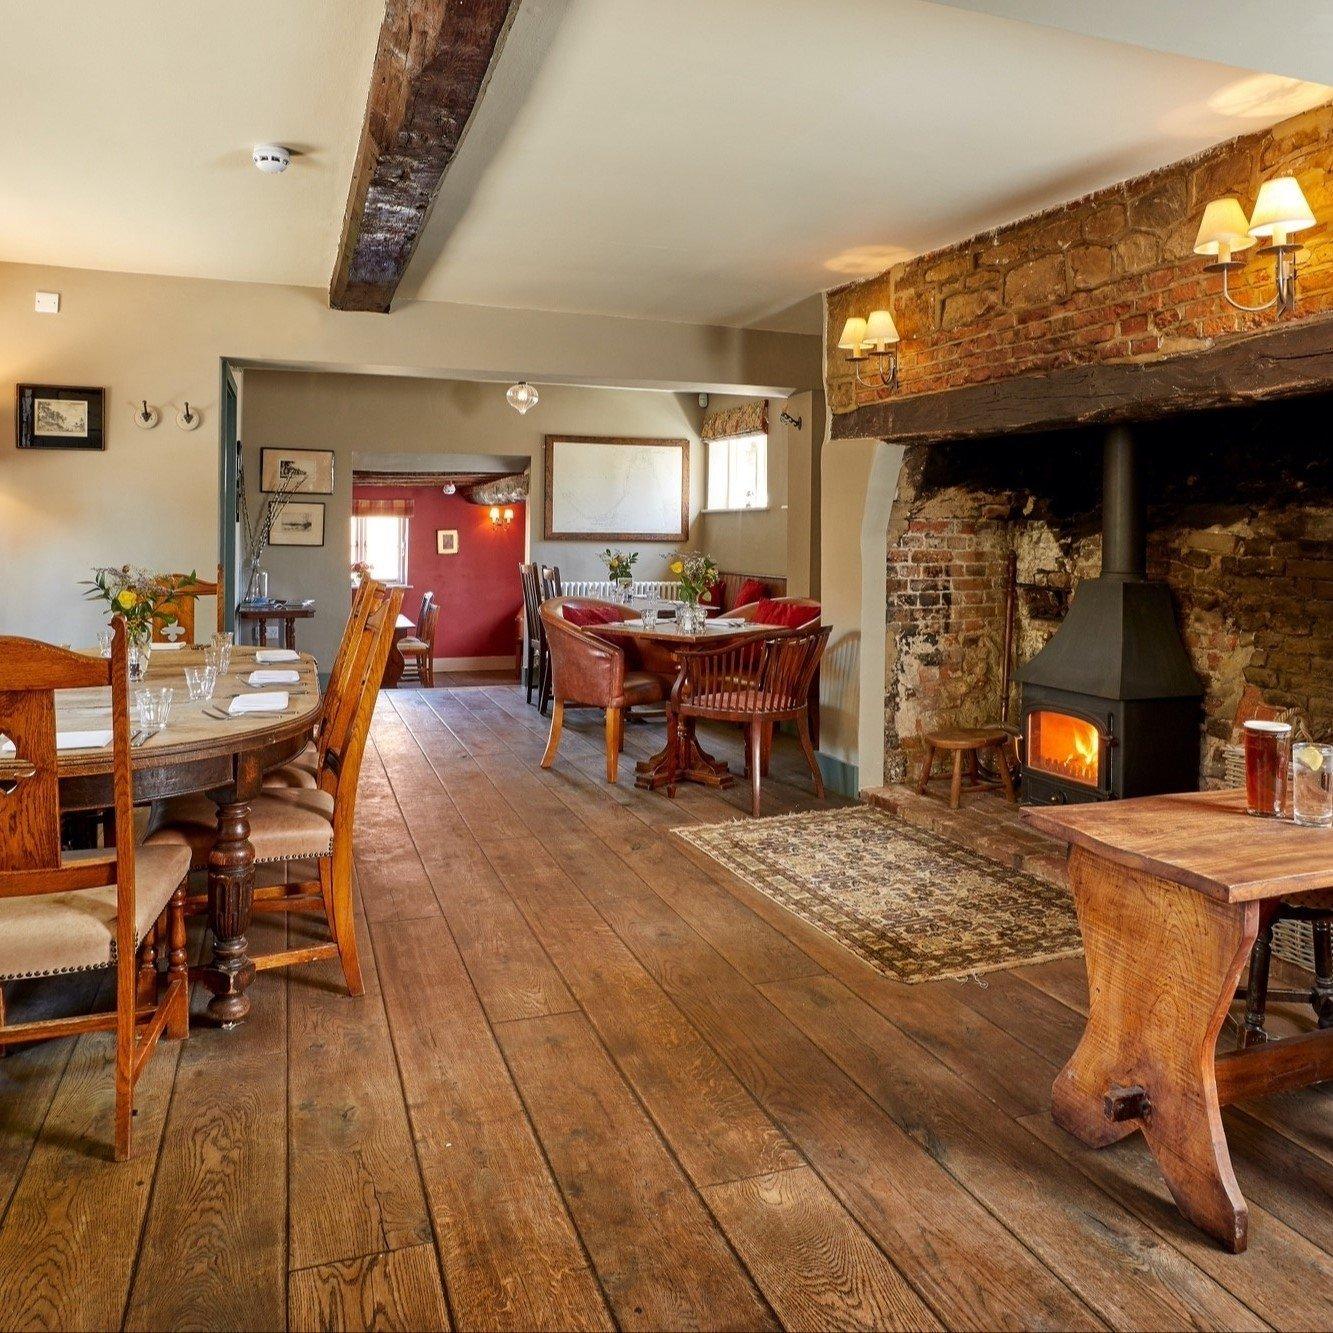 Greyhound Inn, Letcombe Regis, Wantage, Oxfordshire - Gallery Image 10